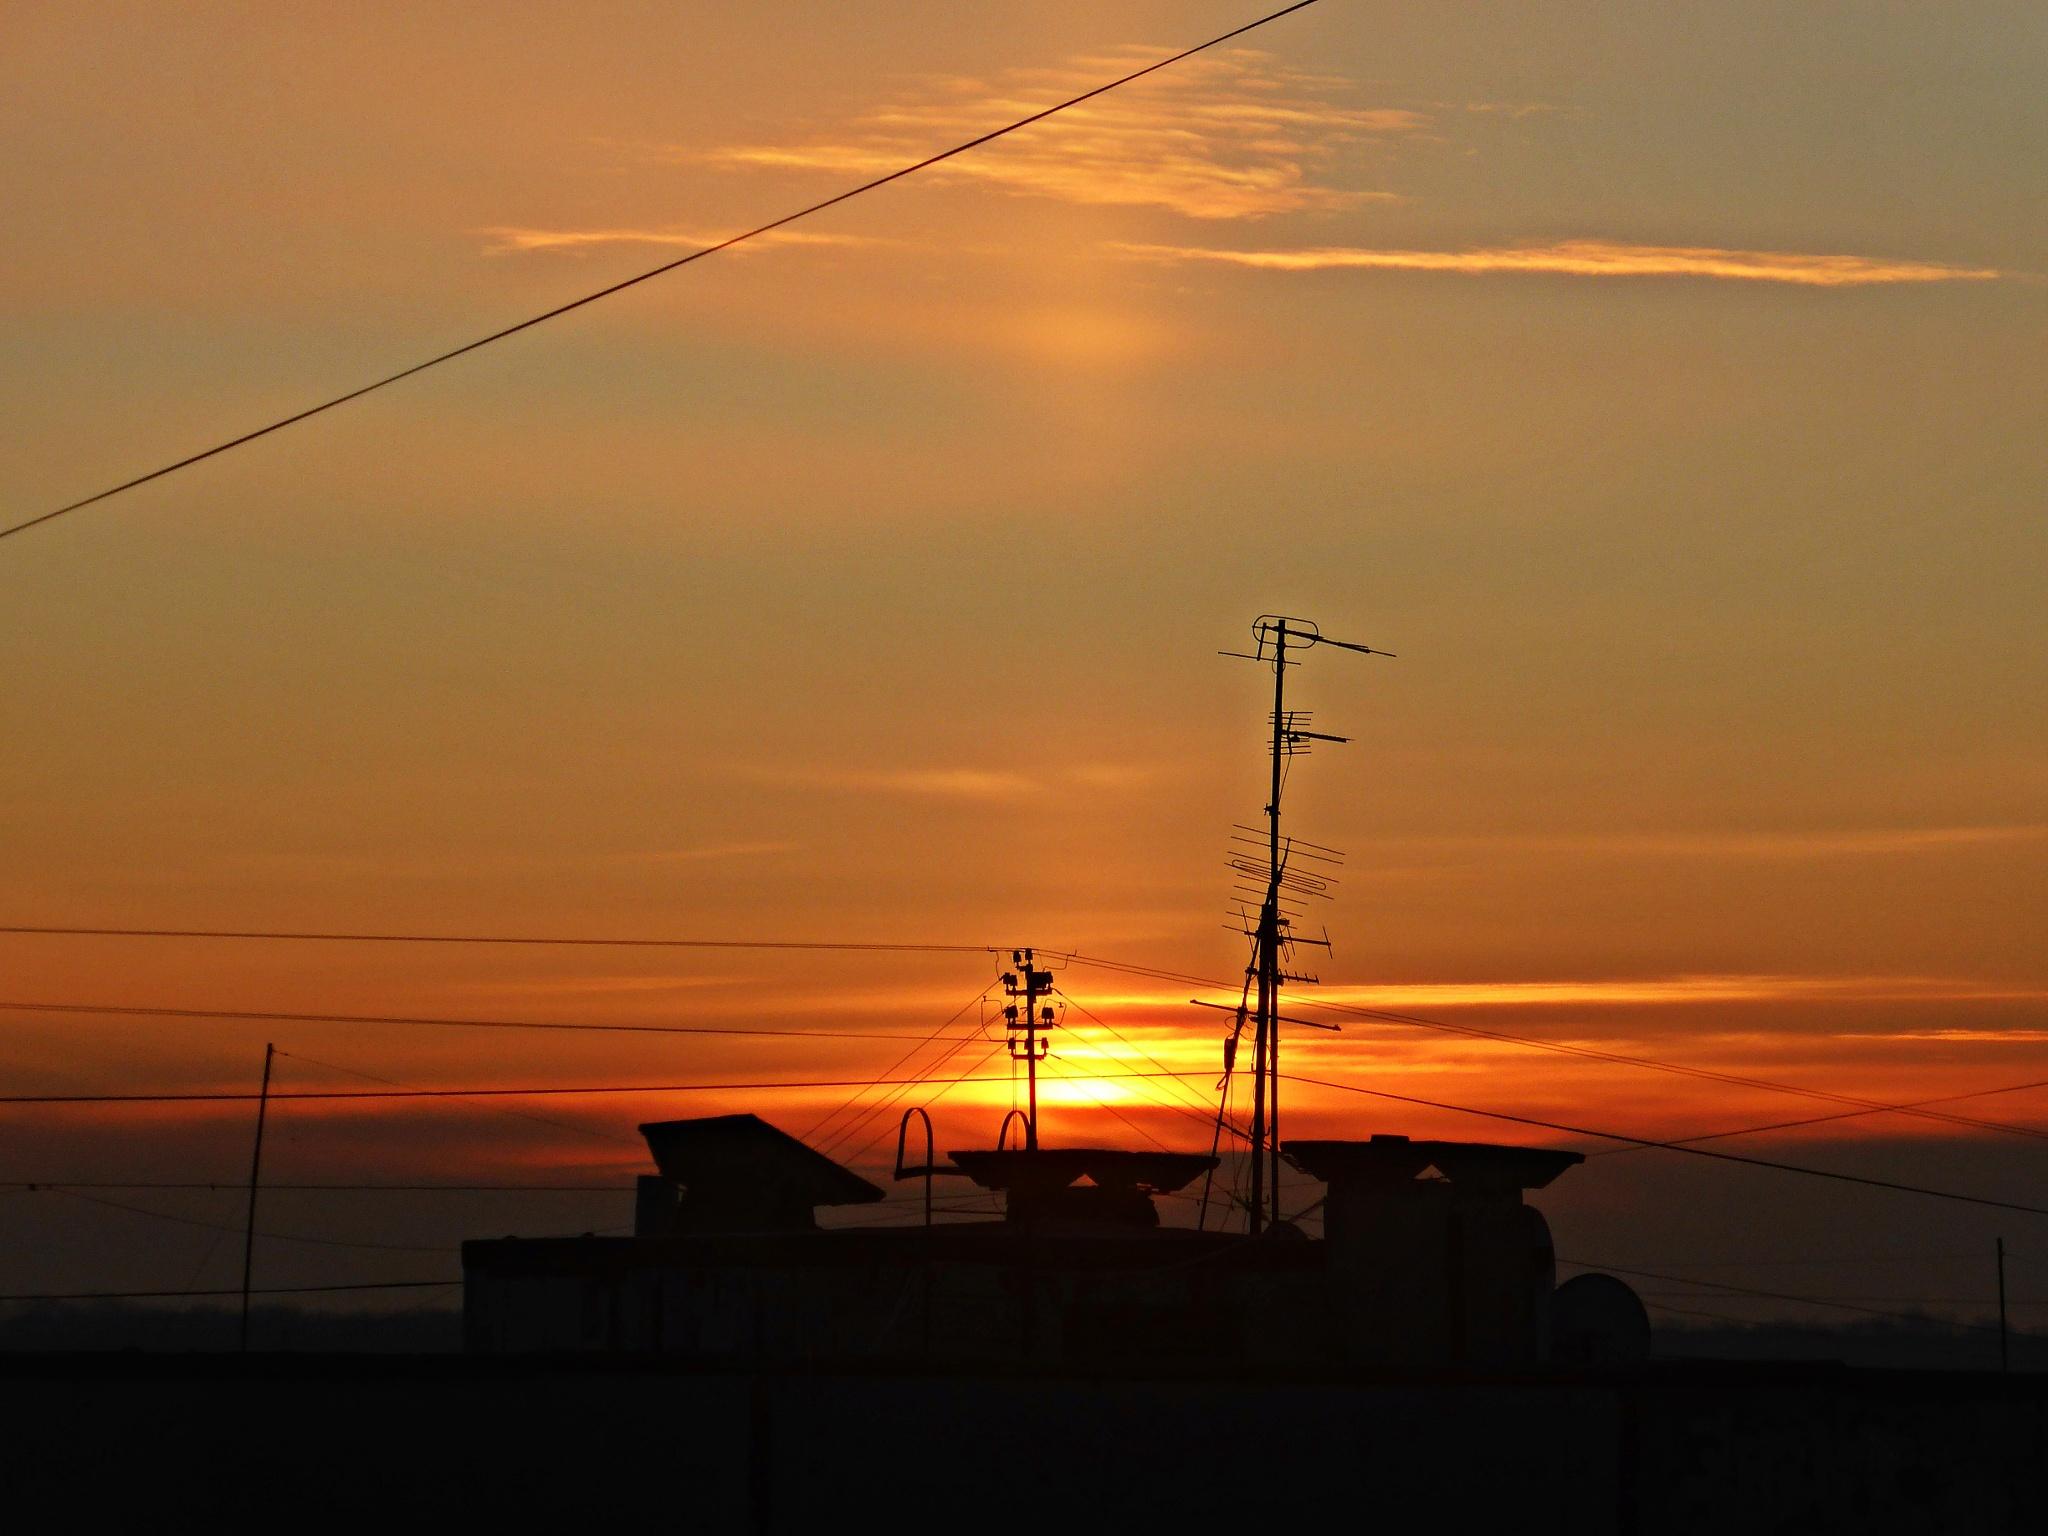 Sunrise in a big city by Luba